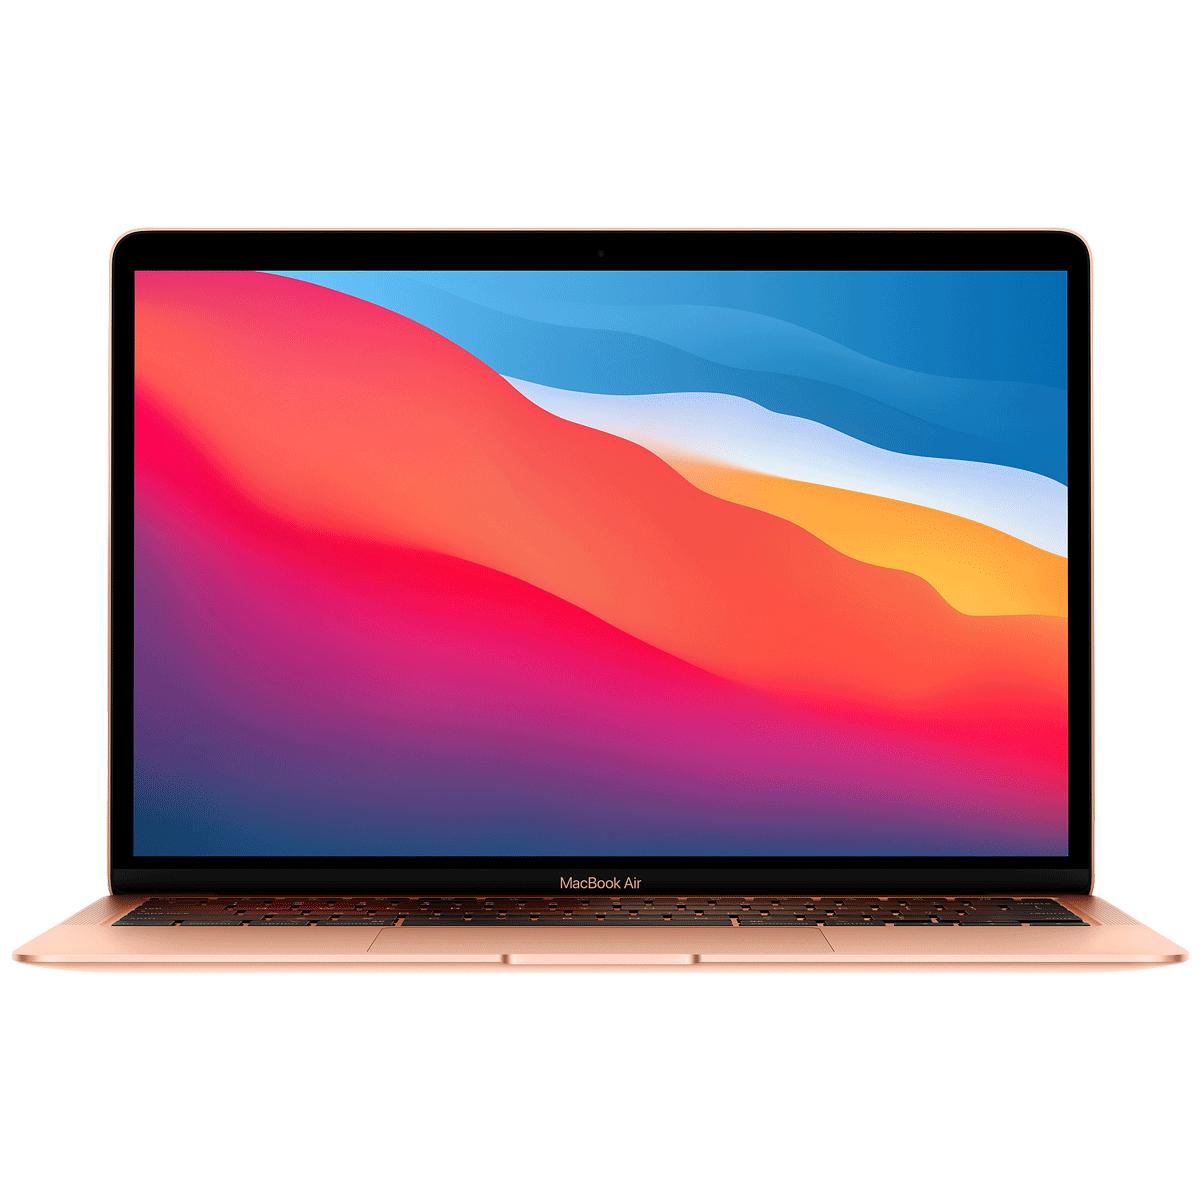 Apple MacBook Air (MGND3HN/A) M1 Chip macOS Big Sur Laptop (8GB RAM, 256GB SSD, Apple M1 GPU, 33.78cm, Gold)_1